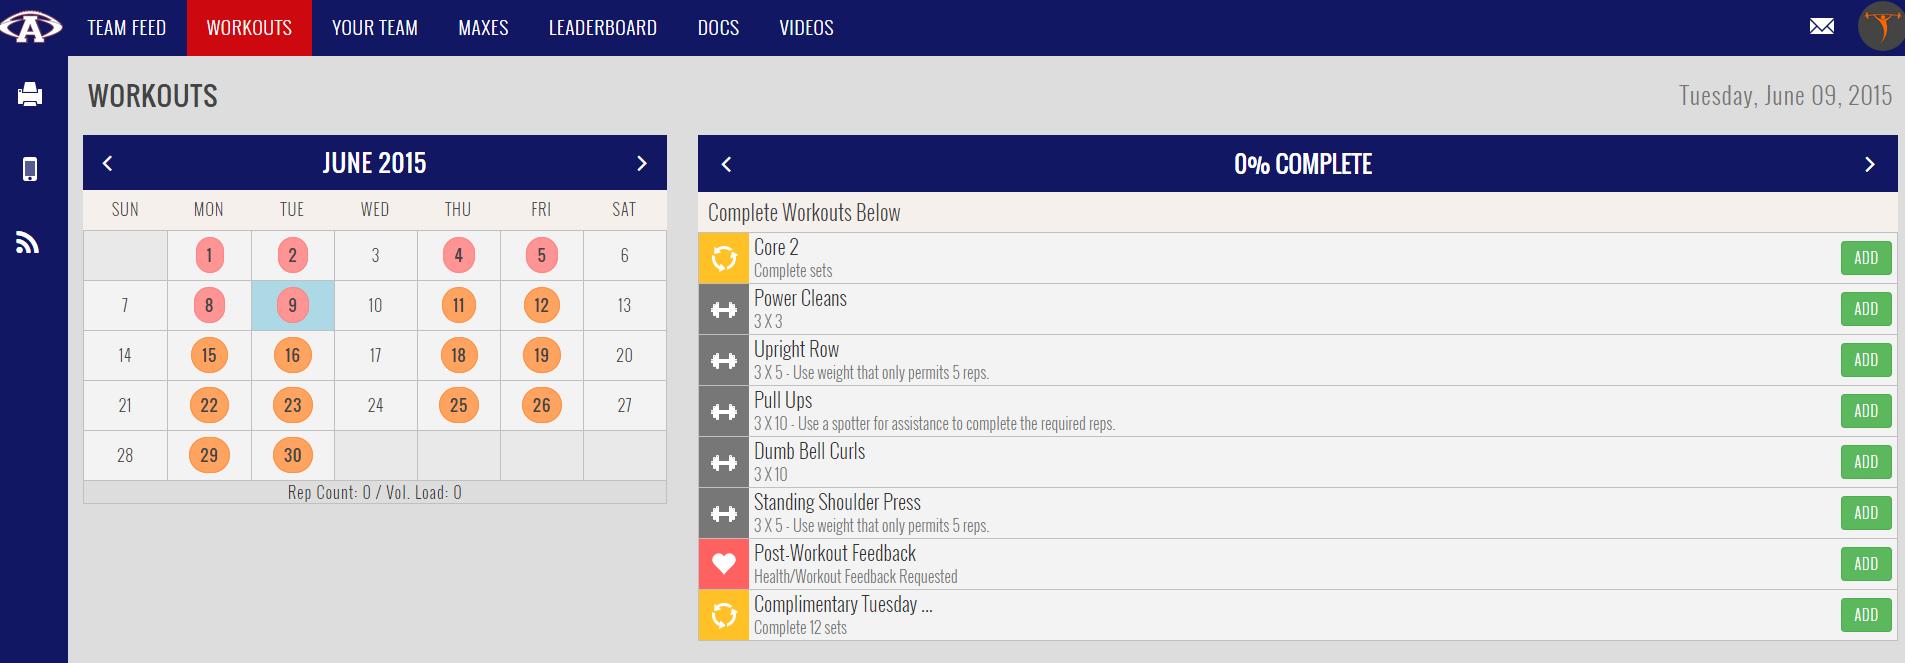 Teambuildr (Workout Tracking) | Avon (CT) High School Football